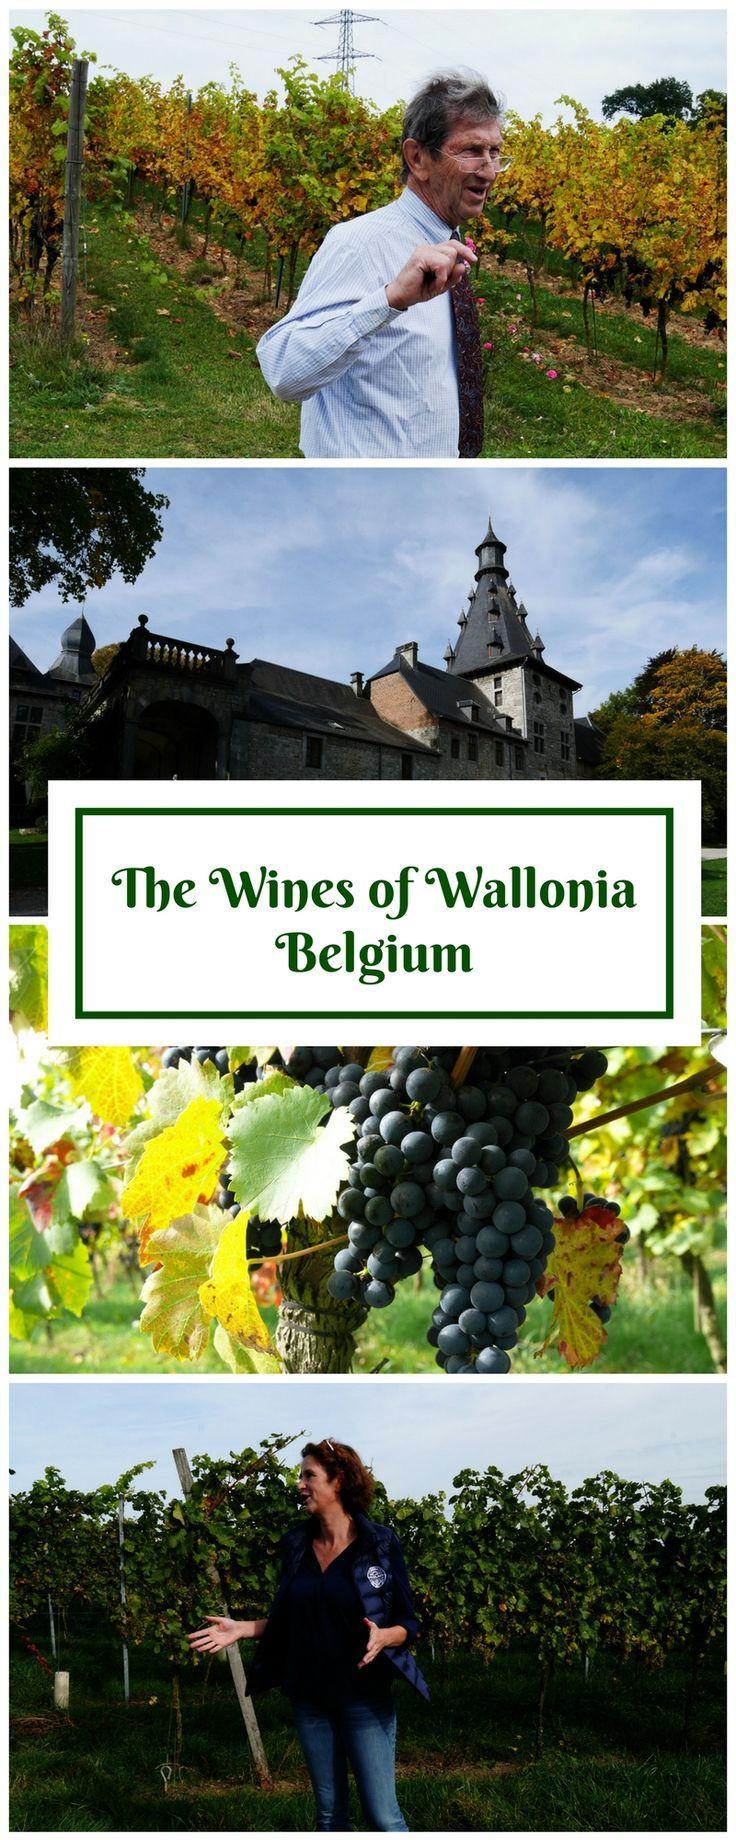 Wines of Wallonia Belgium Gastronomy and Wine in Wallonia | Belgian Wine | Wine Wallonia | Wine Belgium | Gastronomy Wallonia | Food Wallonia | Belgian Gastronomy | Namur Gastronomy